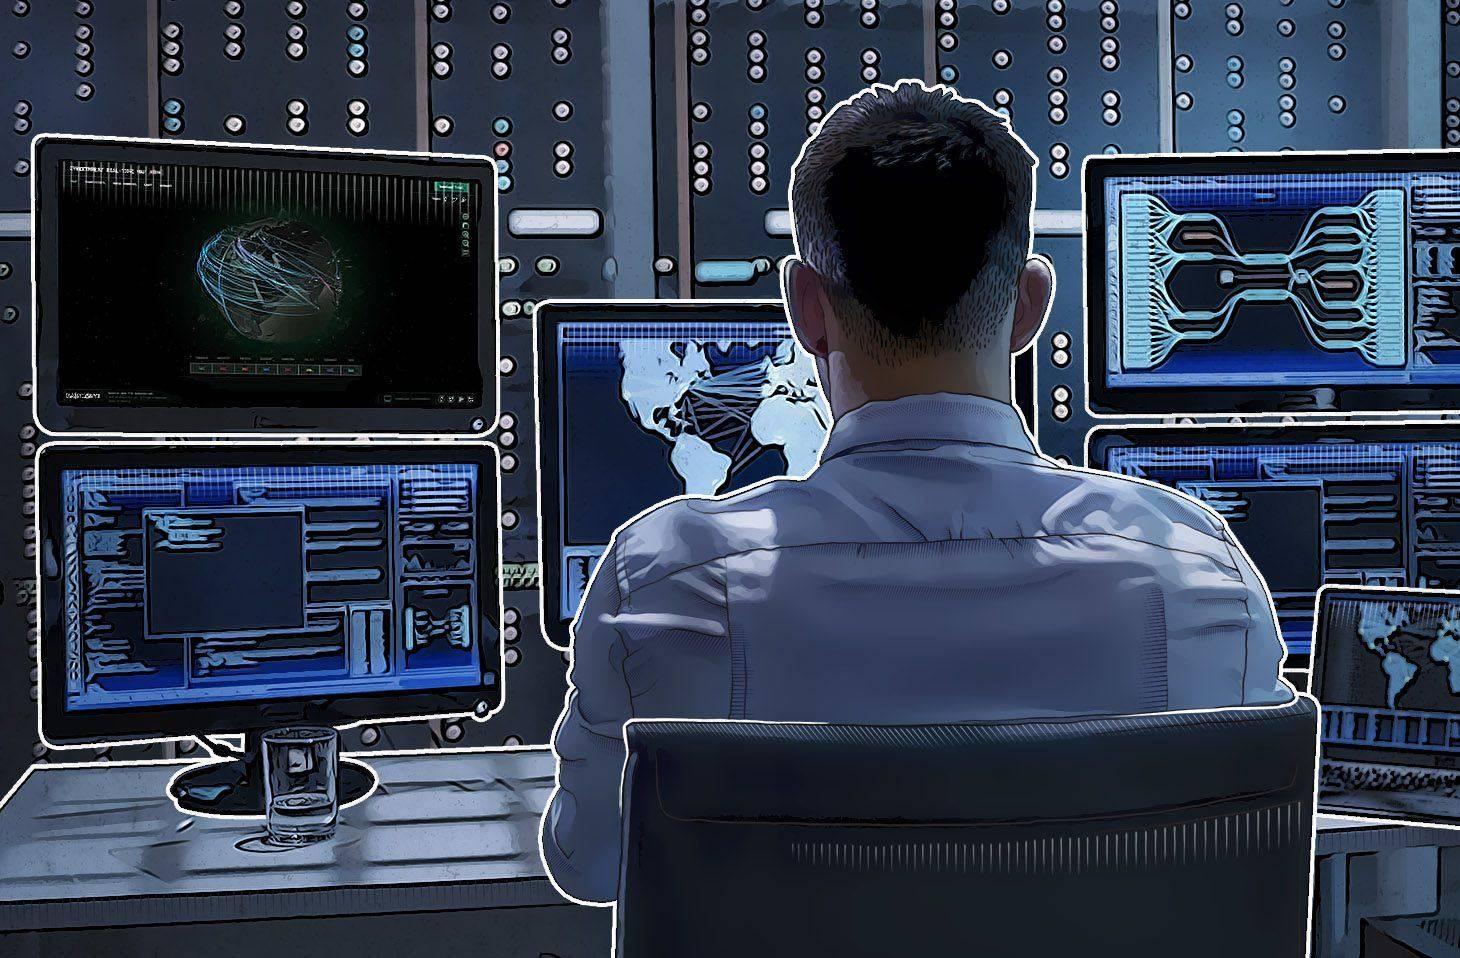 Kaspersky Industrial Control Systems Cyber Emergency Response Team